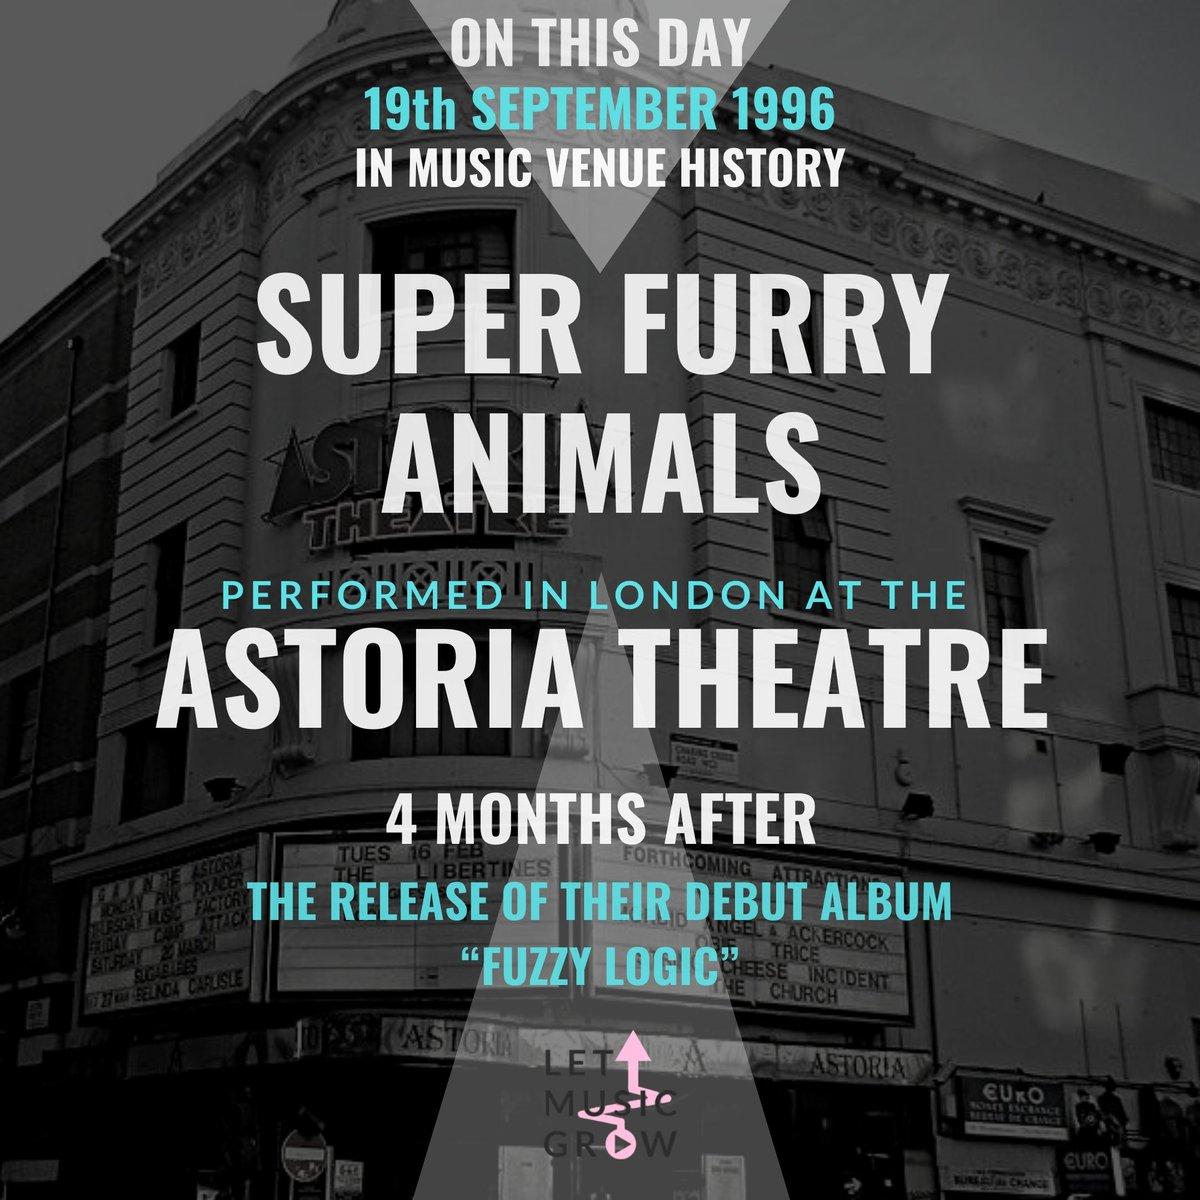 #onthisday #1996 #superfurryanimals #londonastoria #letmusicgrow @superfurry Super Furry Animals, SFA #music #musicvenues #classicalbum #letthemusicplay #saveourvenues #saveourstages #mvt #NIVA https://t.co/Gbh94DEZ0Z